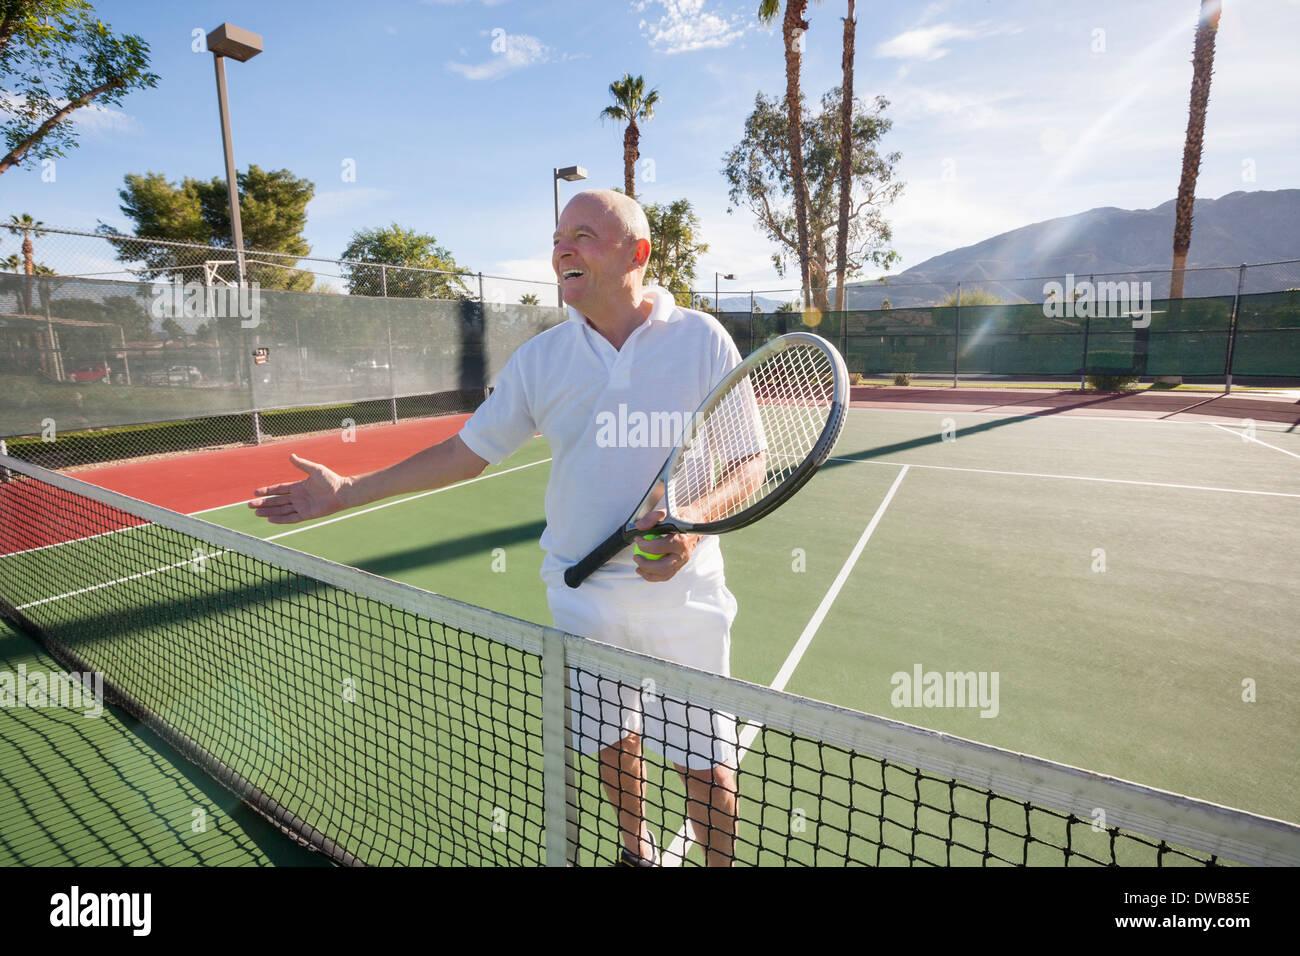 Felice senior tennista offrendo handshake su corte Immagini Stock